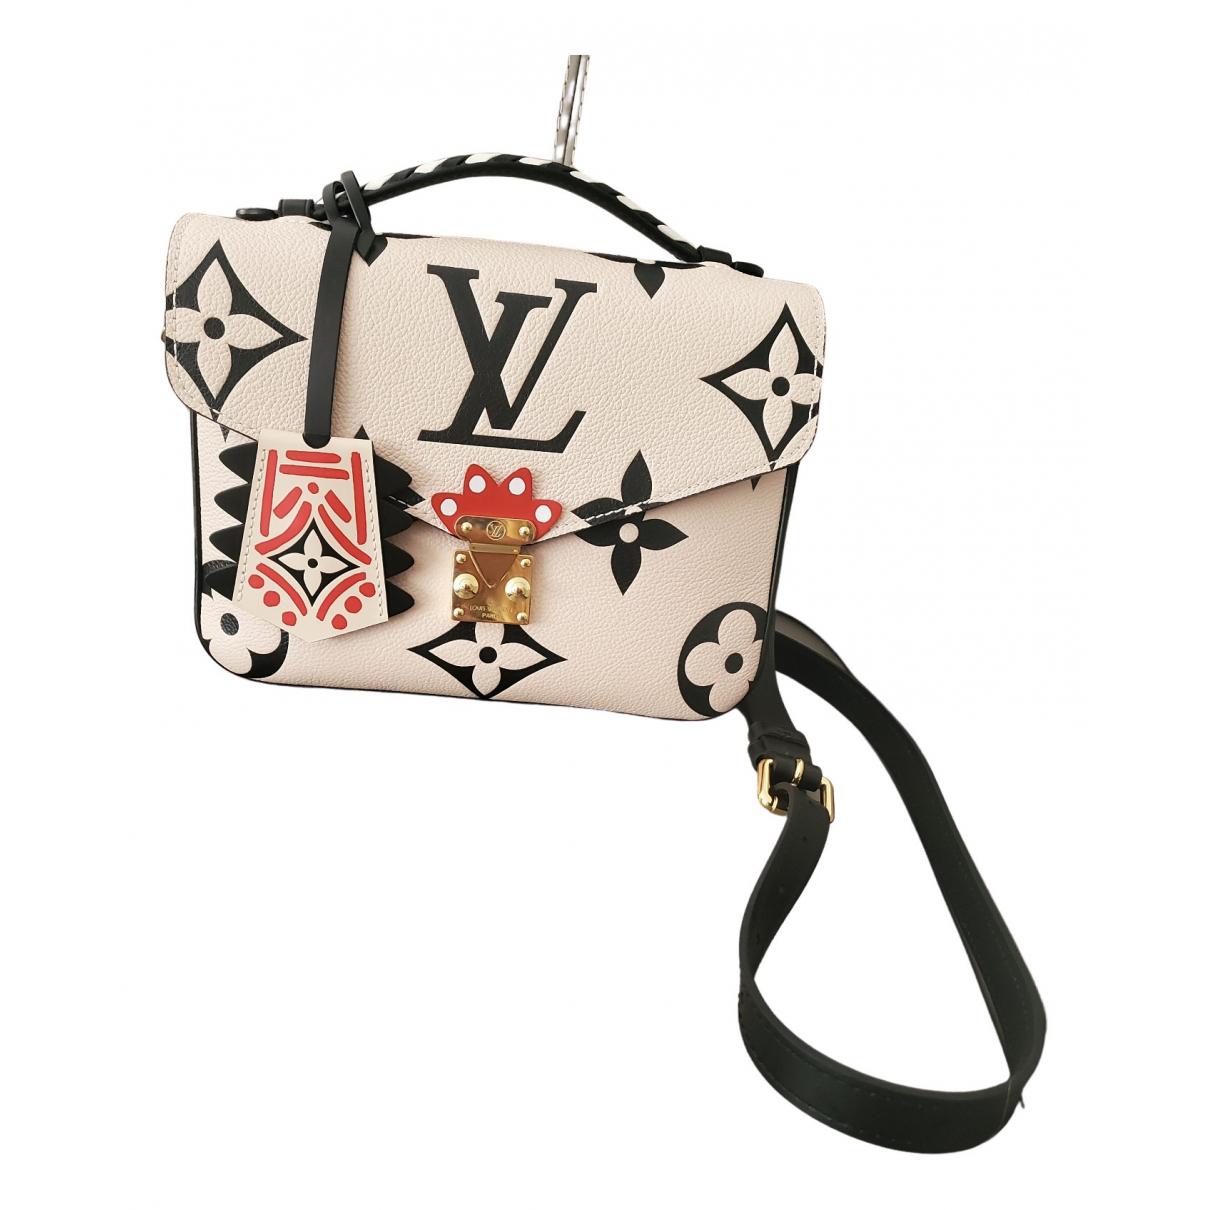 Louis Vuitton - Sac a main Metis pour femme en cuir - ecru